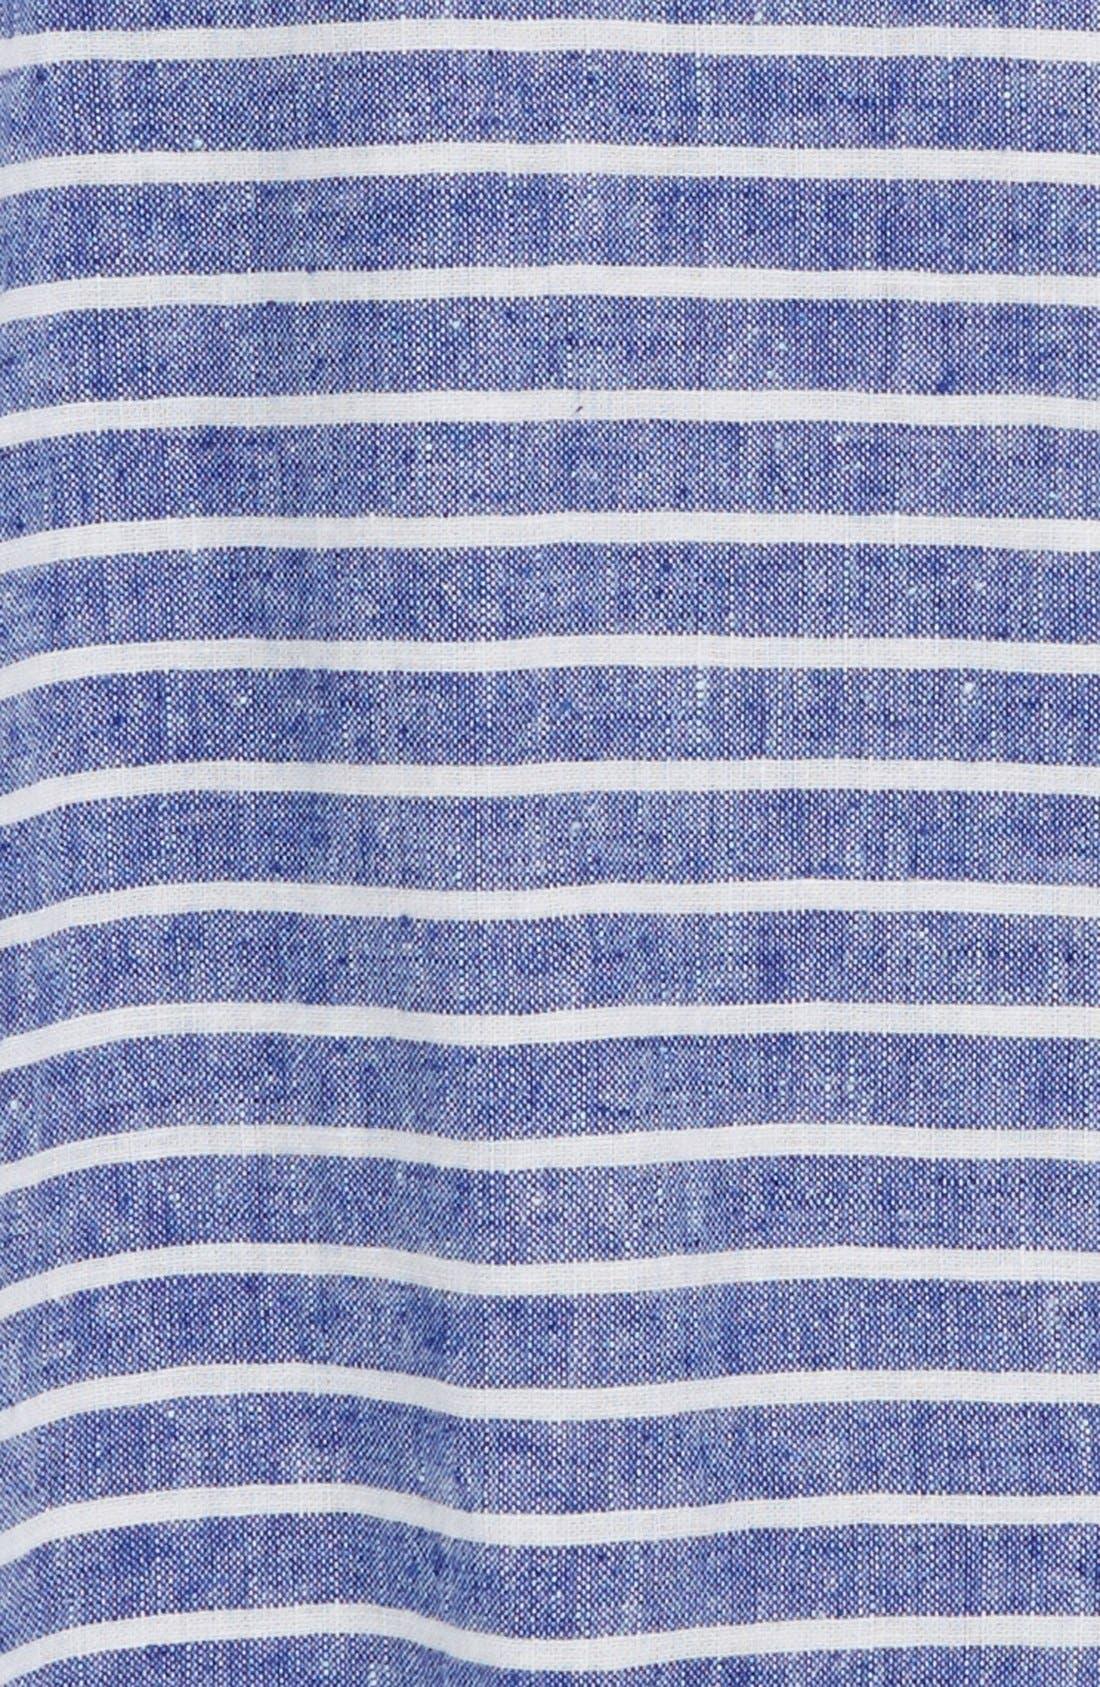 Alternate Image 2  - Johnnie B by Boden 'Summer' Button Front Linen & Cotton Shirt (Big Boys)